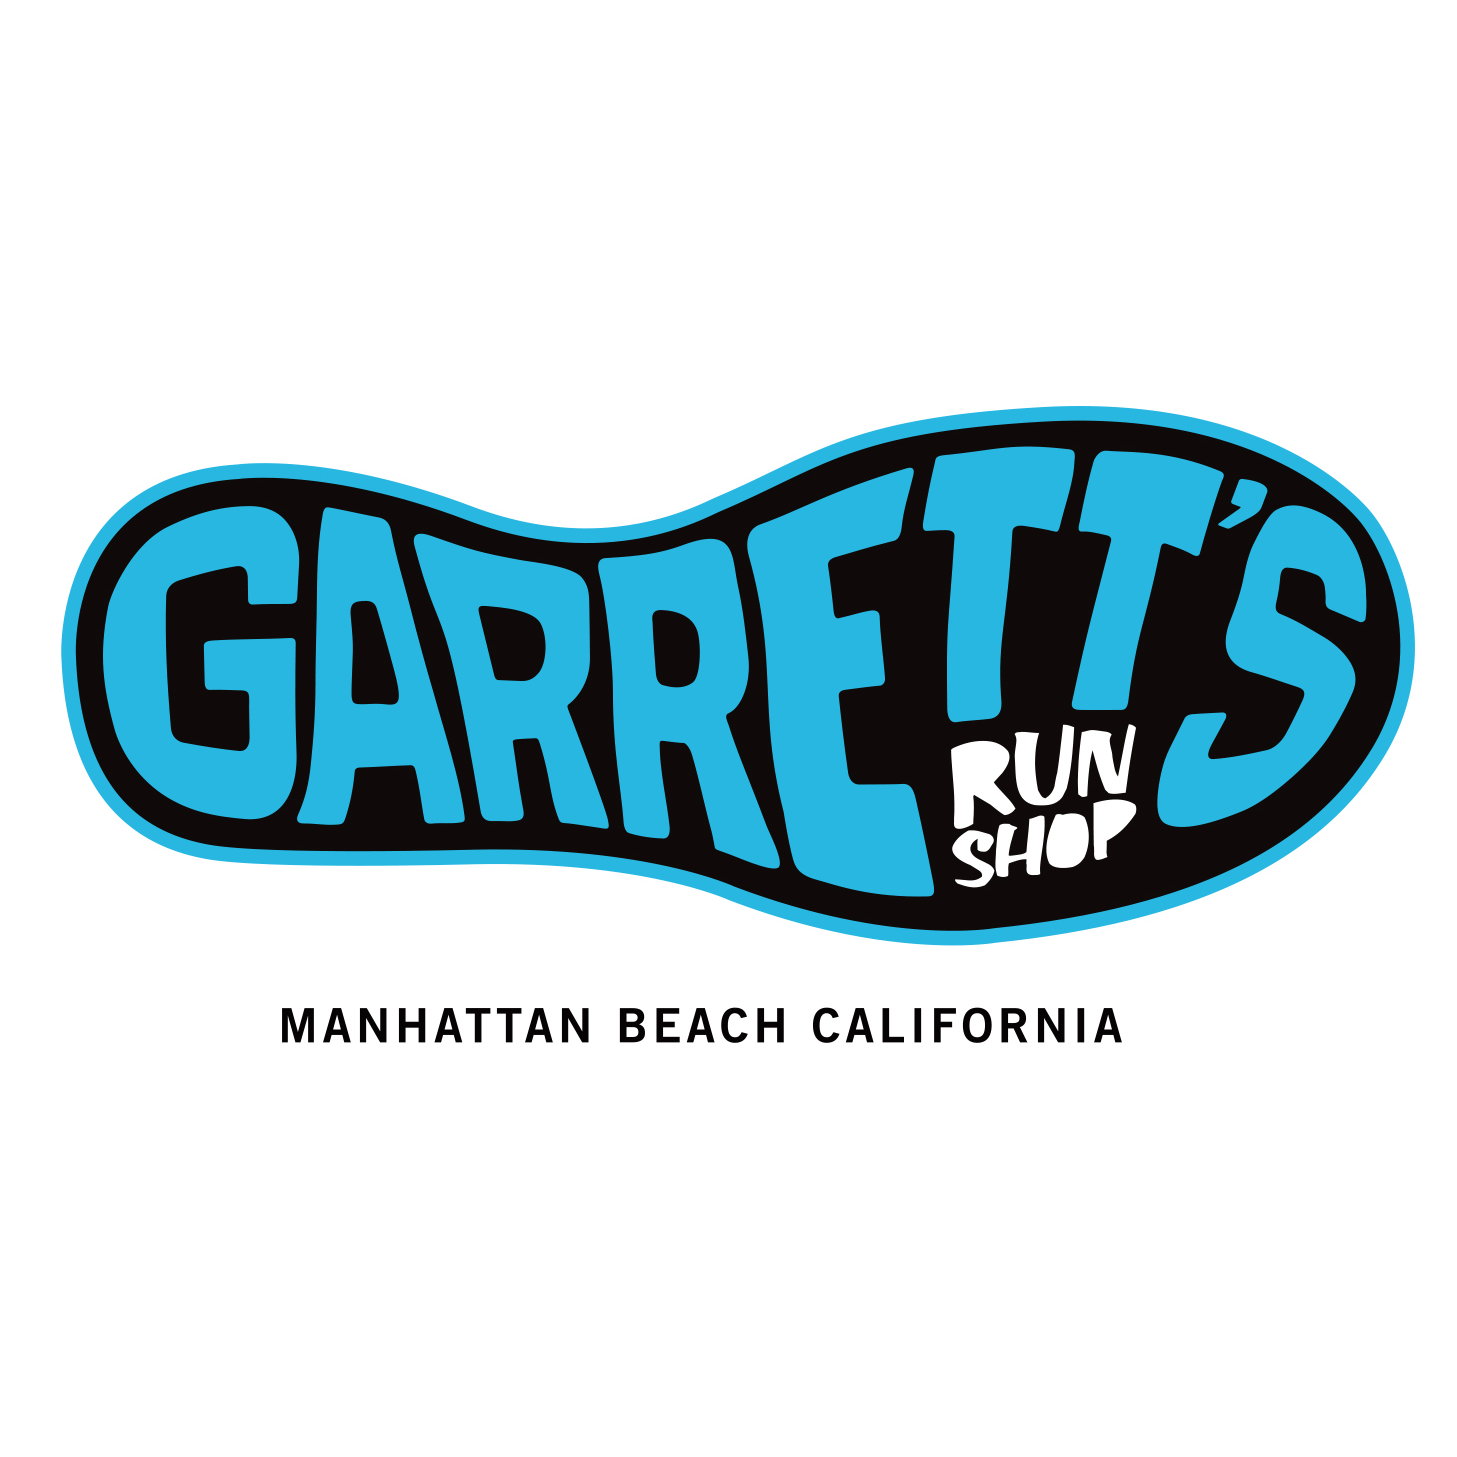 Garrett's Run Shop